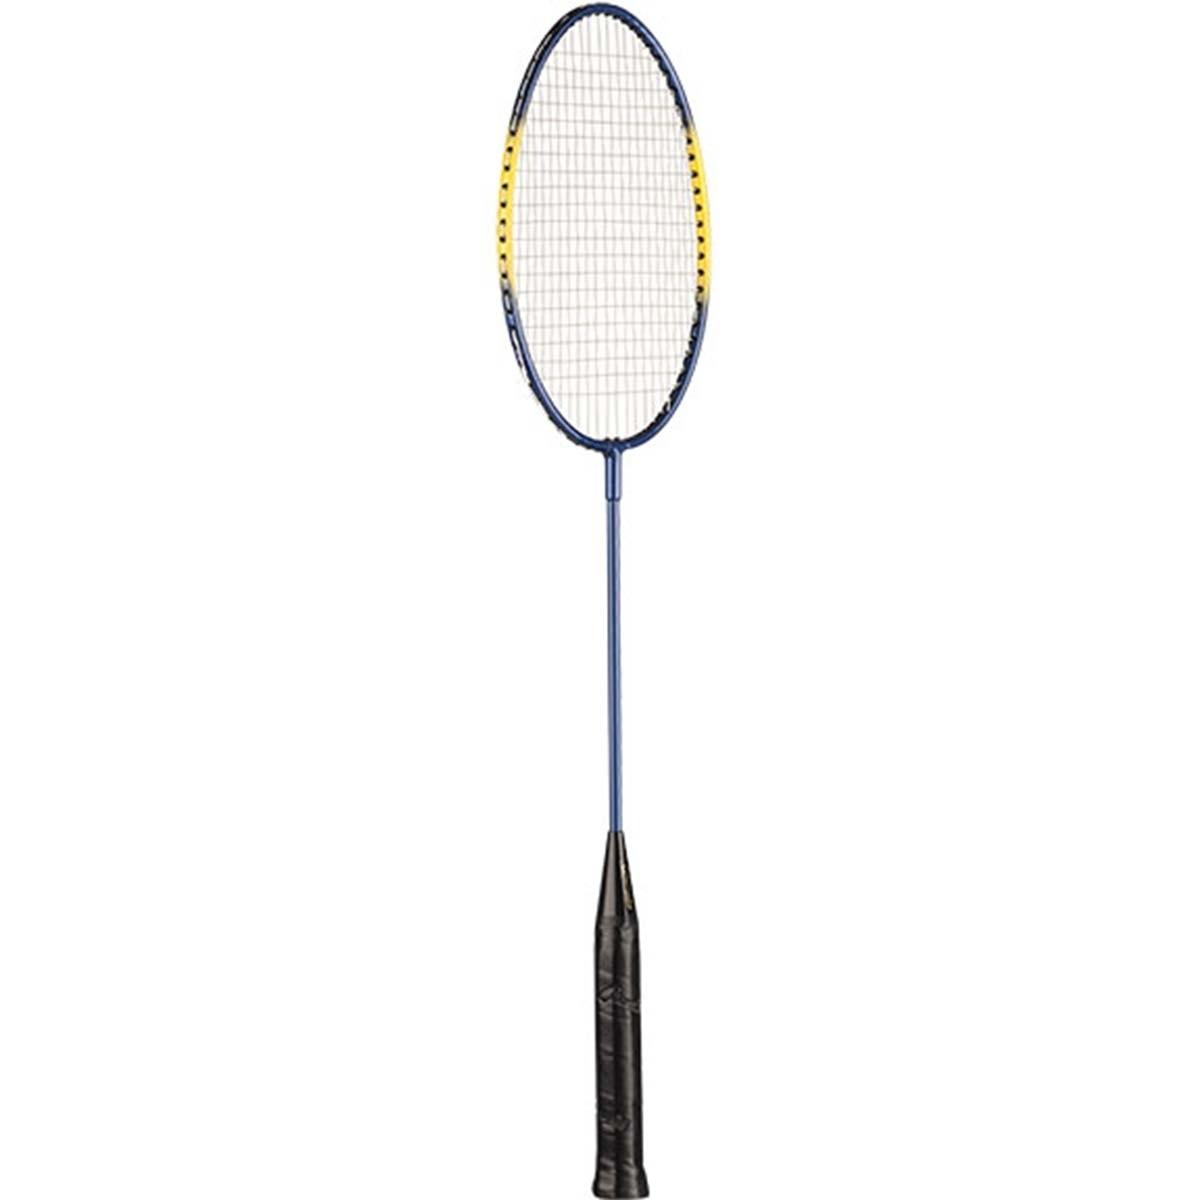 Set of 2 Bundle Champion Sports Heavy-Duty Steel Frame Badminton Racket Black